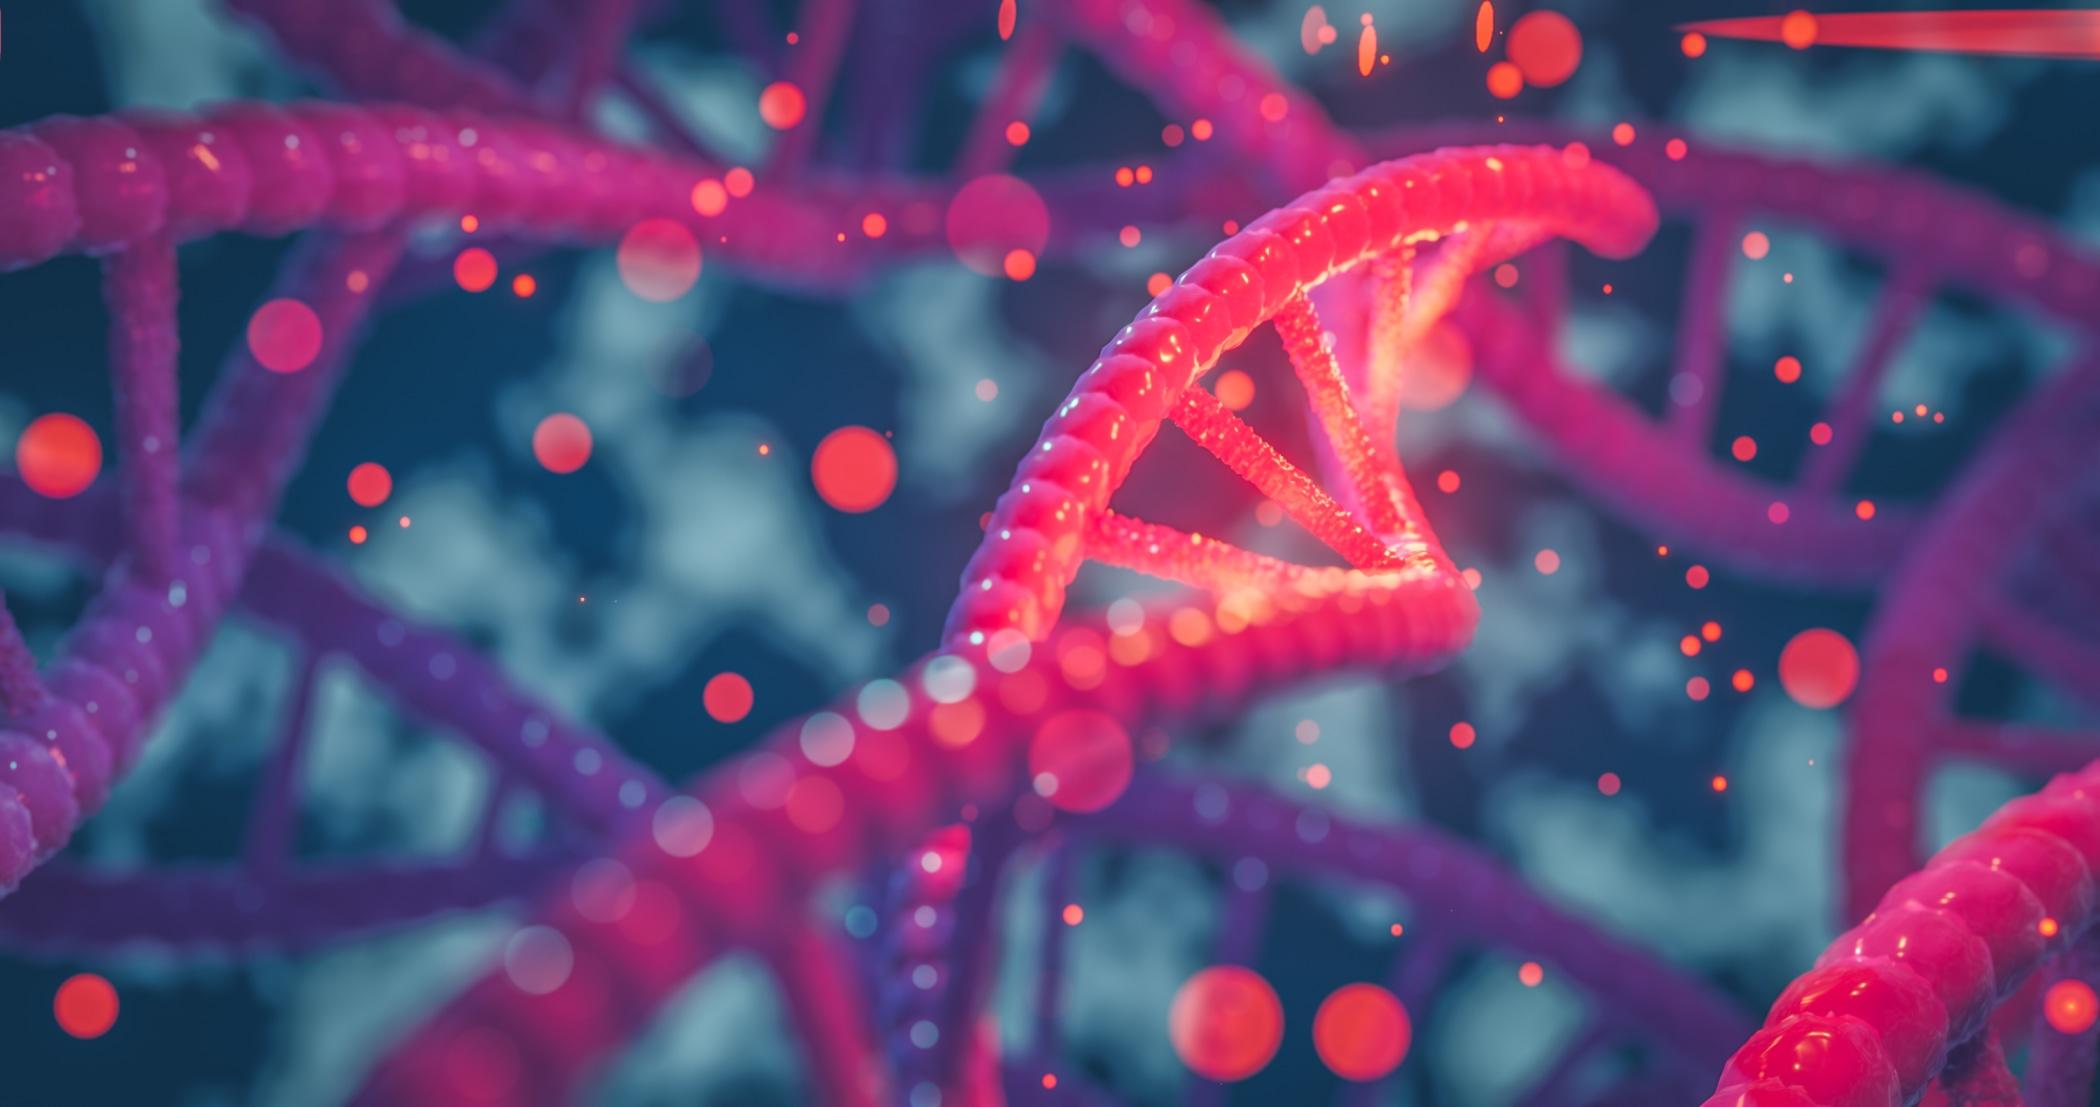 Cutting edge genomic analysis identifies genes related to hydrocephalus